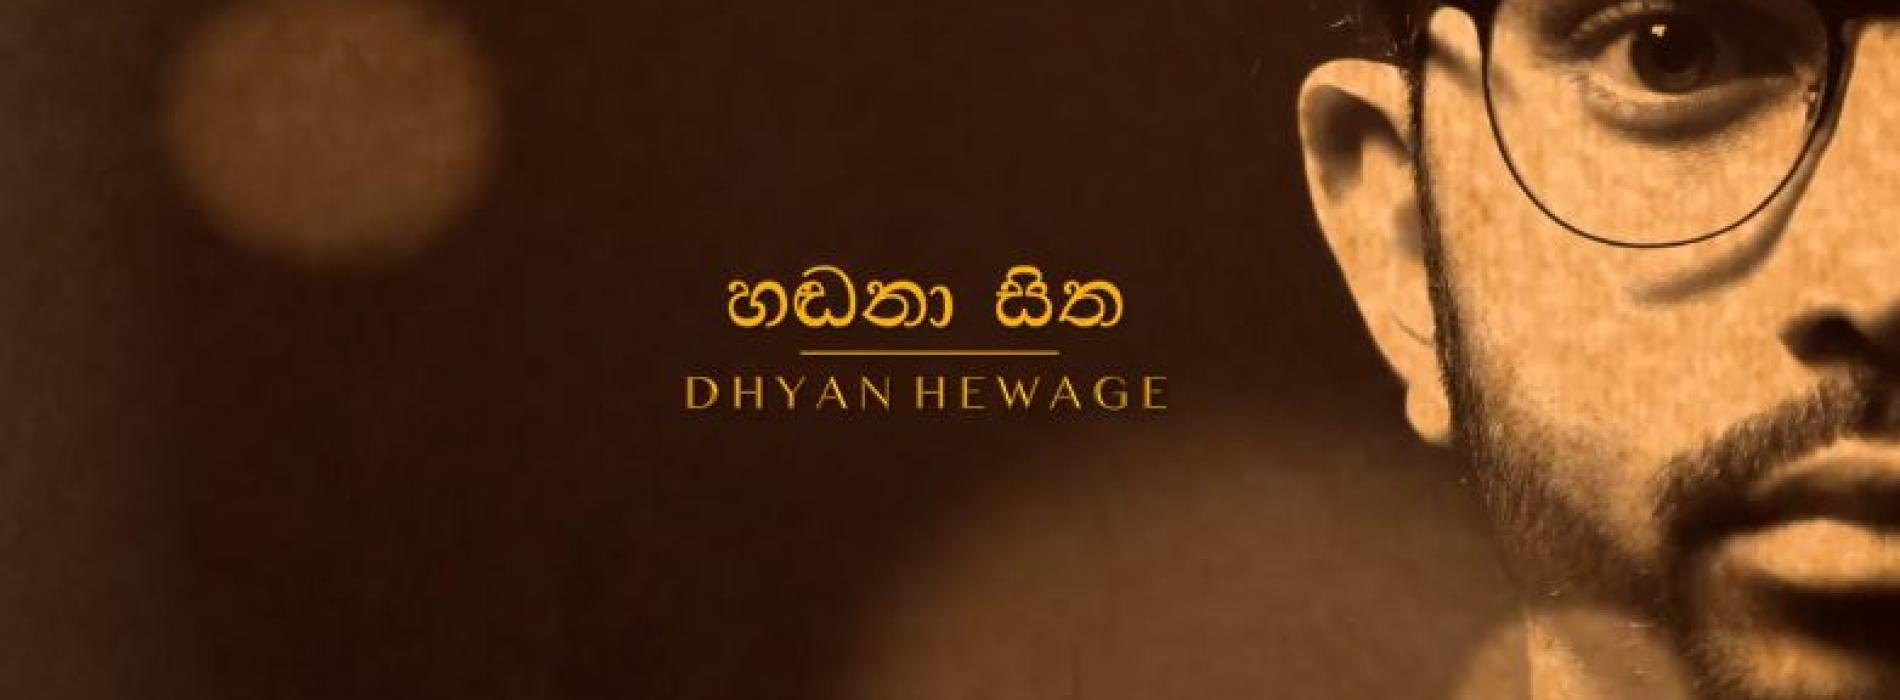 New Music : Dhyan Hewage – හඬනා සිත Handana Sitha